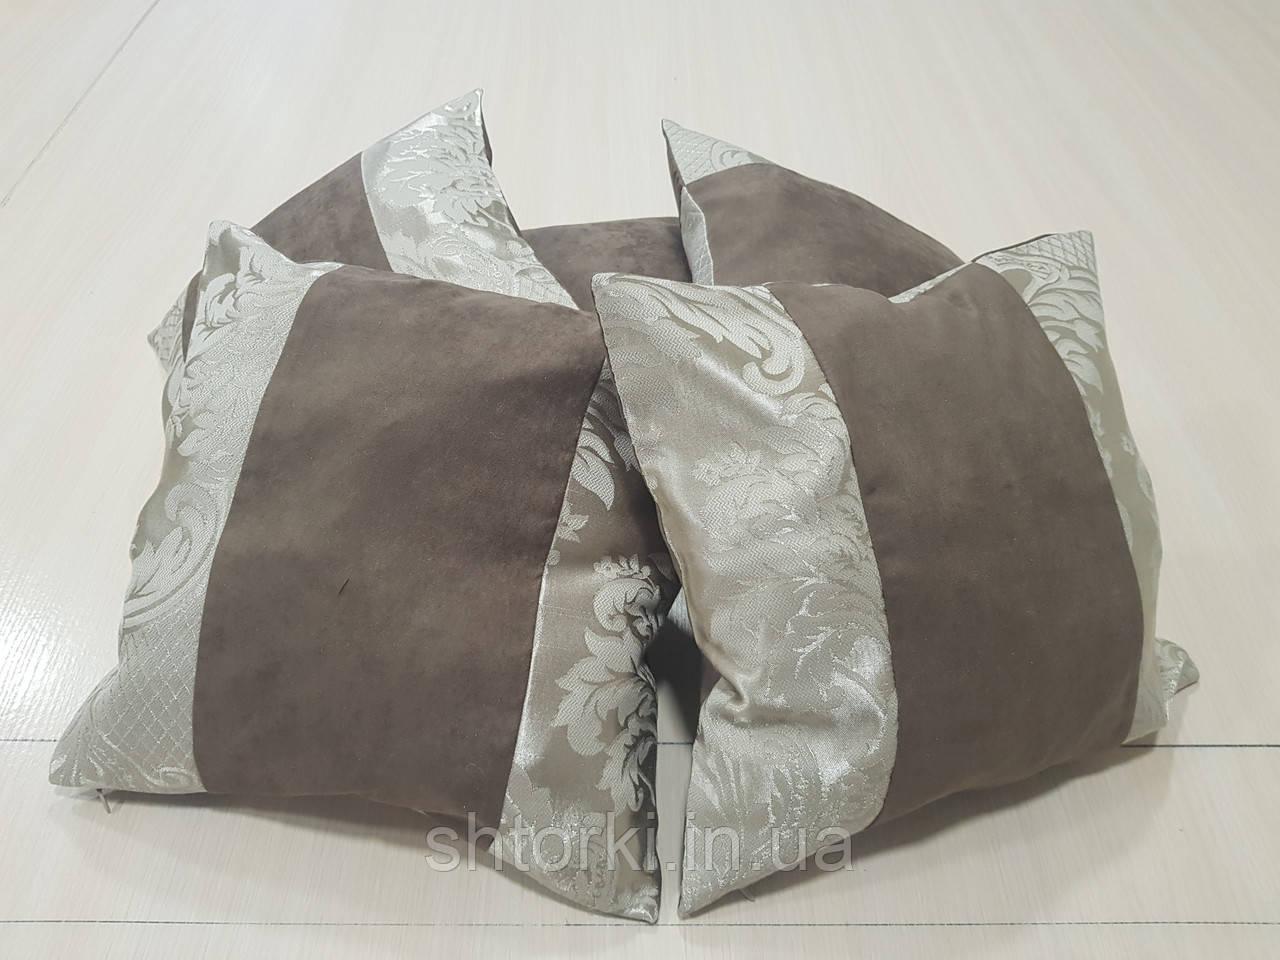 Комплект подушек Шоколад с бежевым узором 5шт